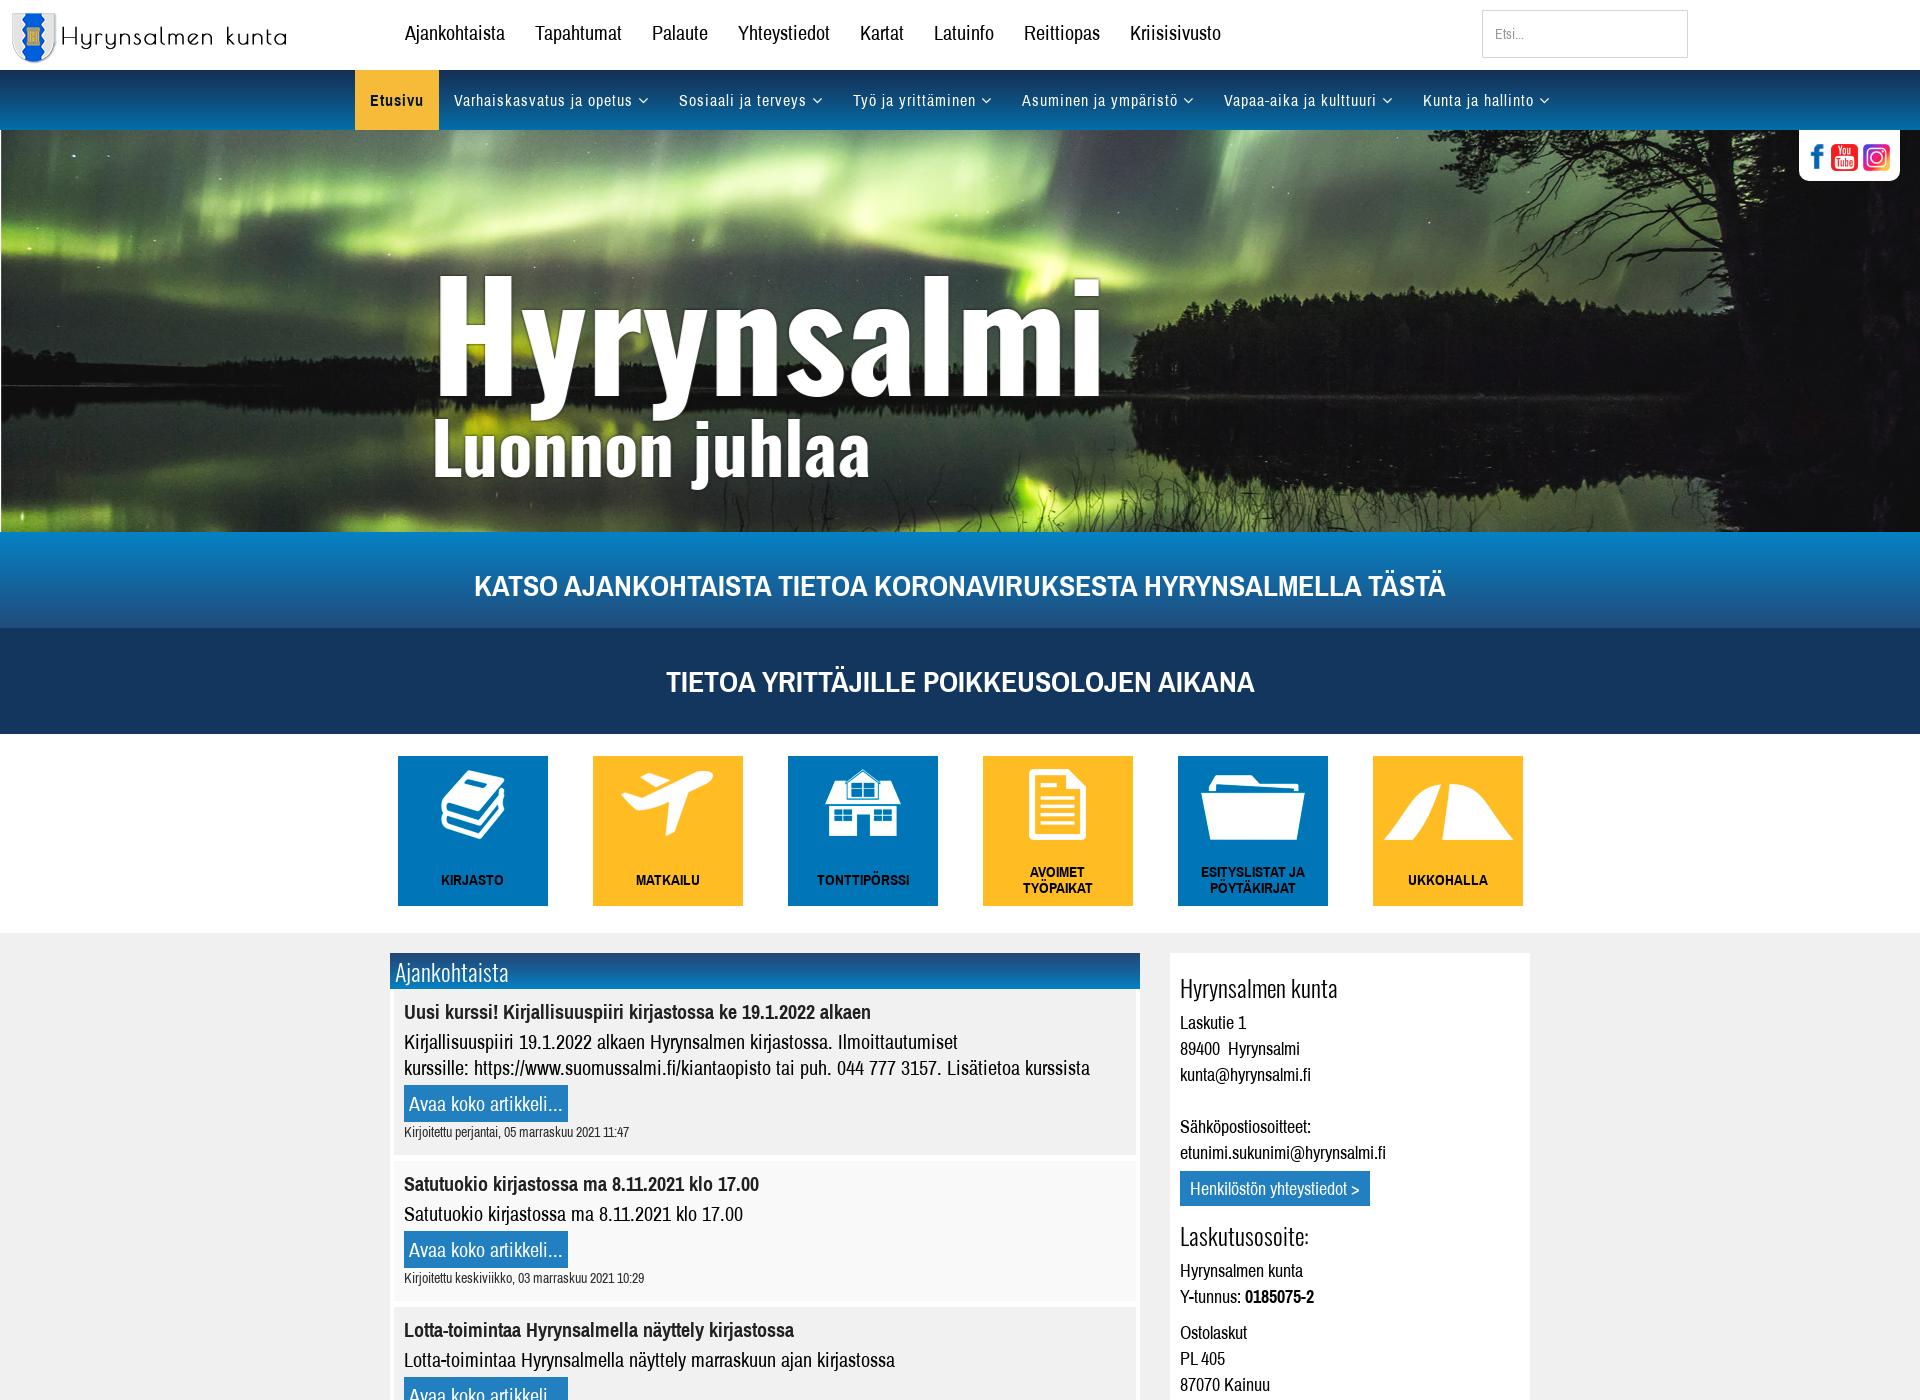 Screenshot for hyrynsalmi.fi